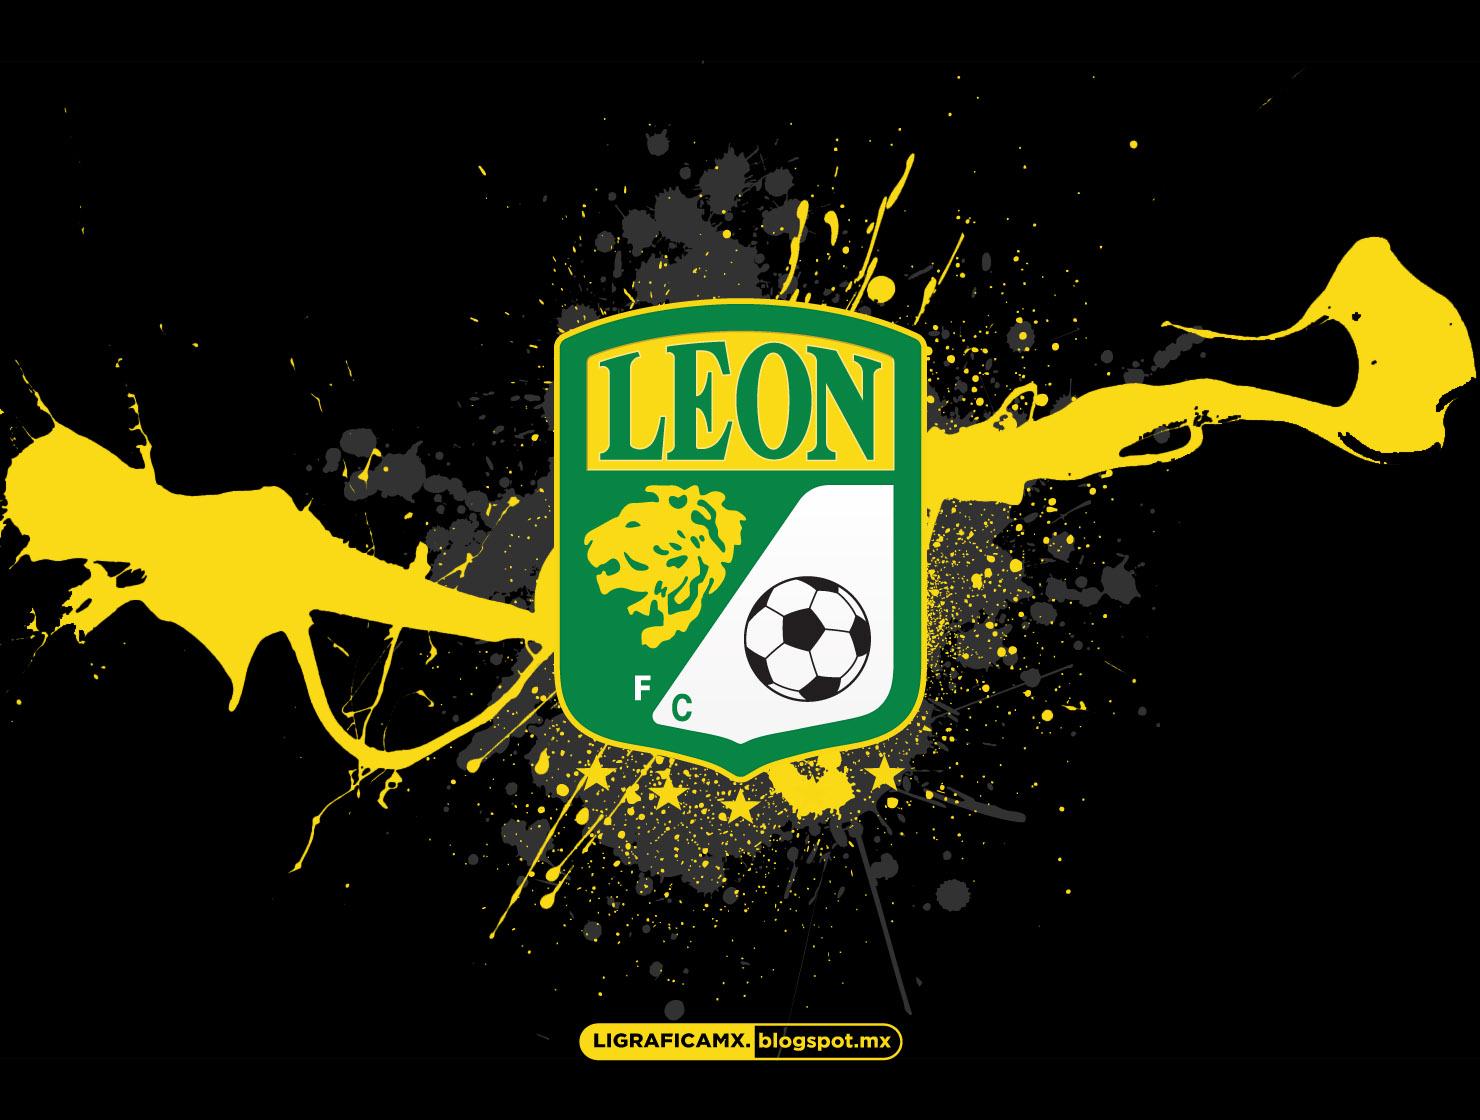 Club Leon Fc Wallpaper club leon fc logo wallpapers for pinterest